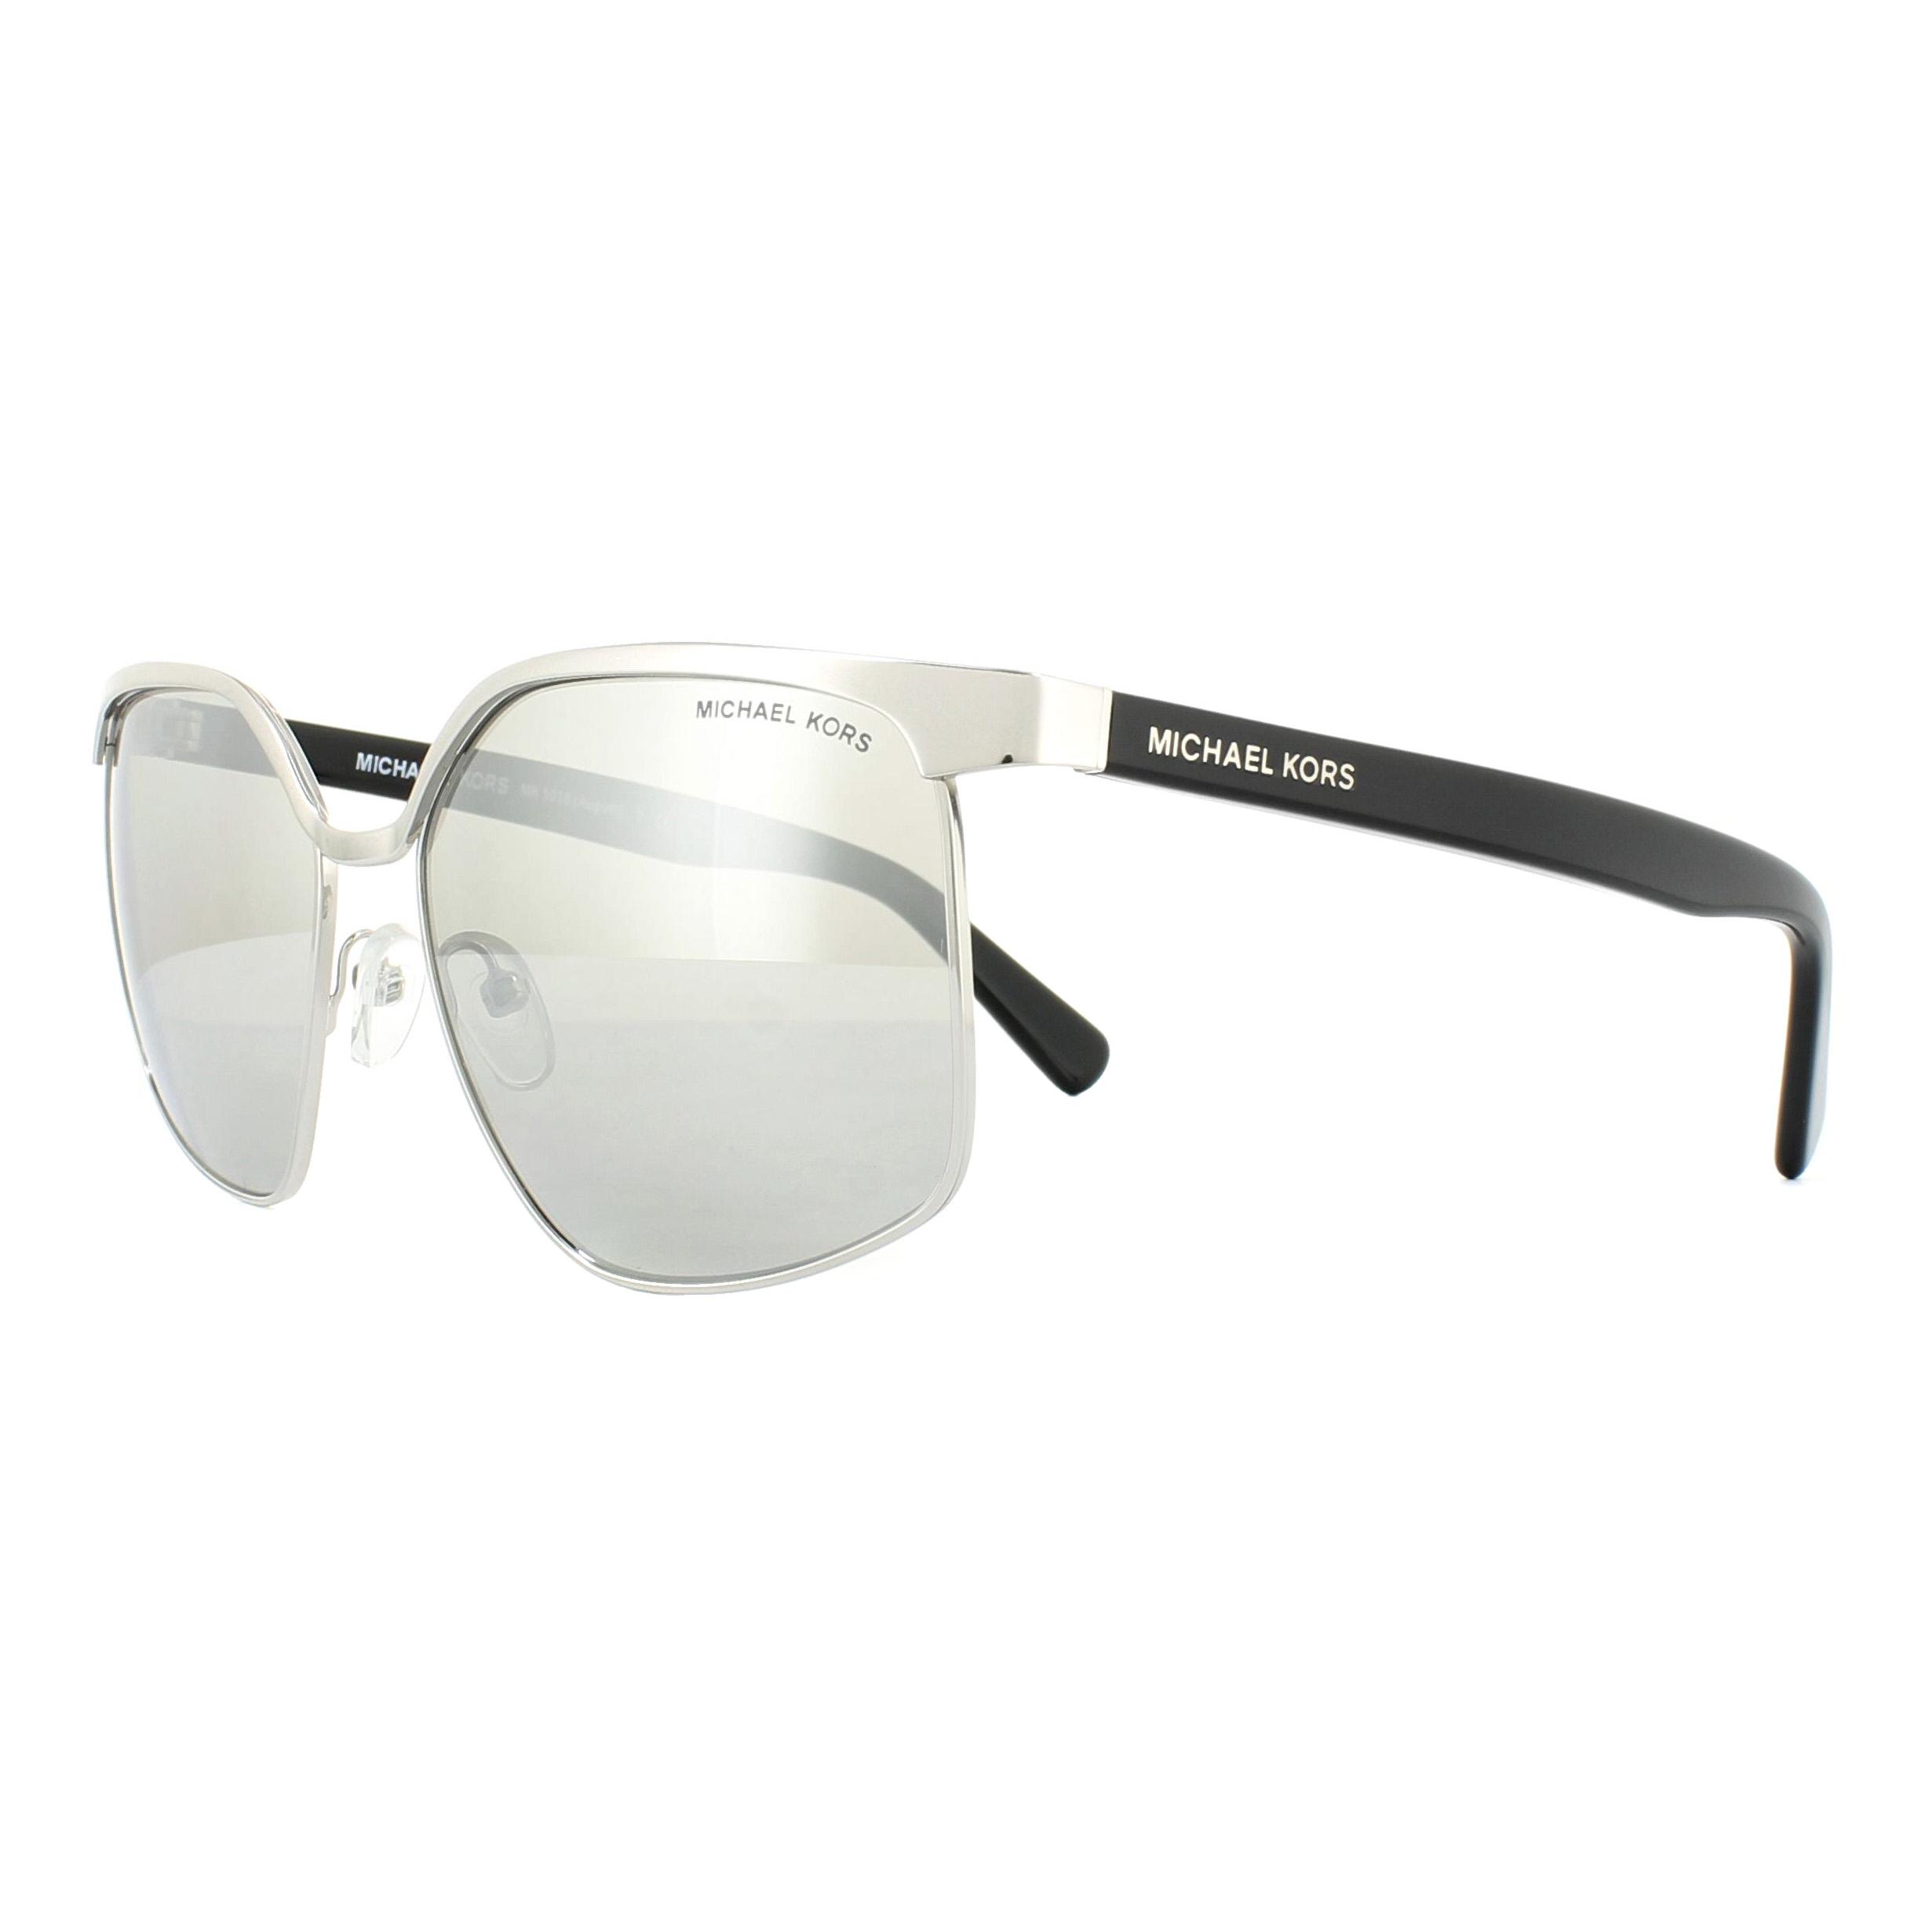 f1e1cd6c3c94c Sentinel Michael Kors Sunglasses August 1018 11486G Silver Silver Mirror